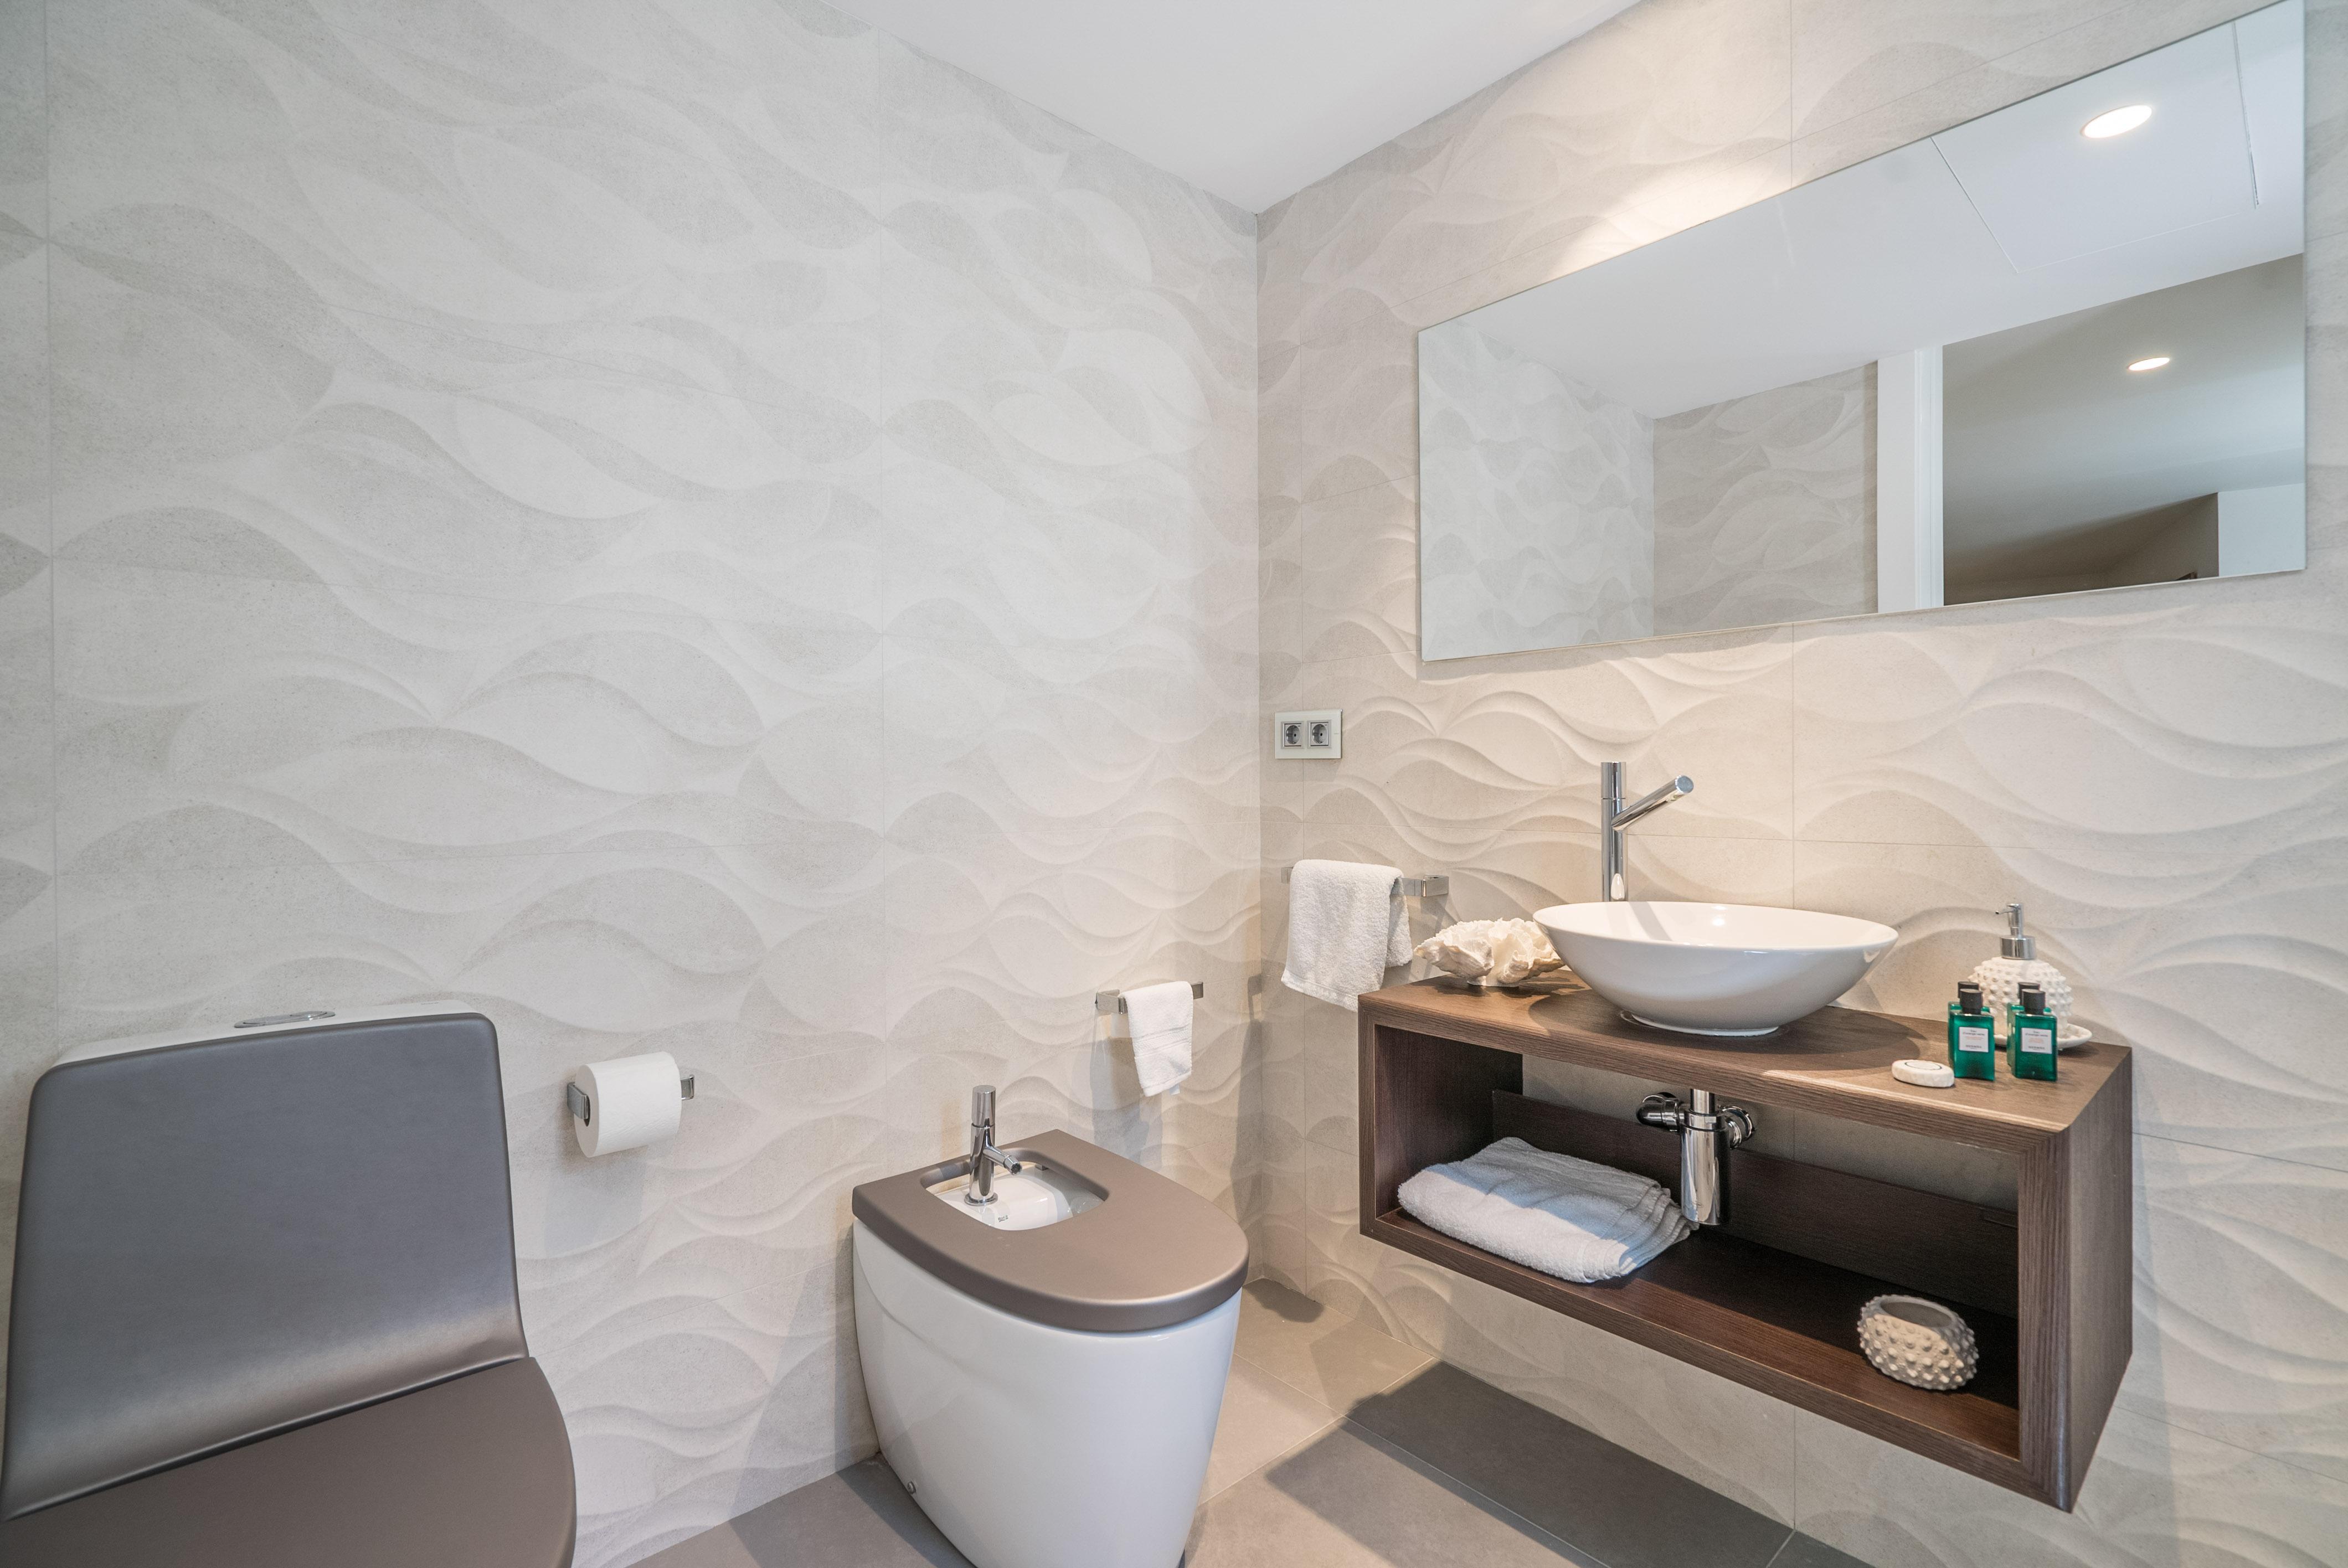 VILLA VALERIA - Ivory Suite Bathroom (1)